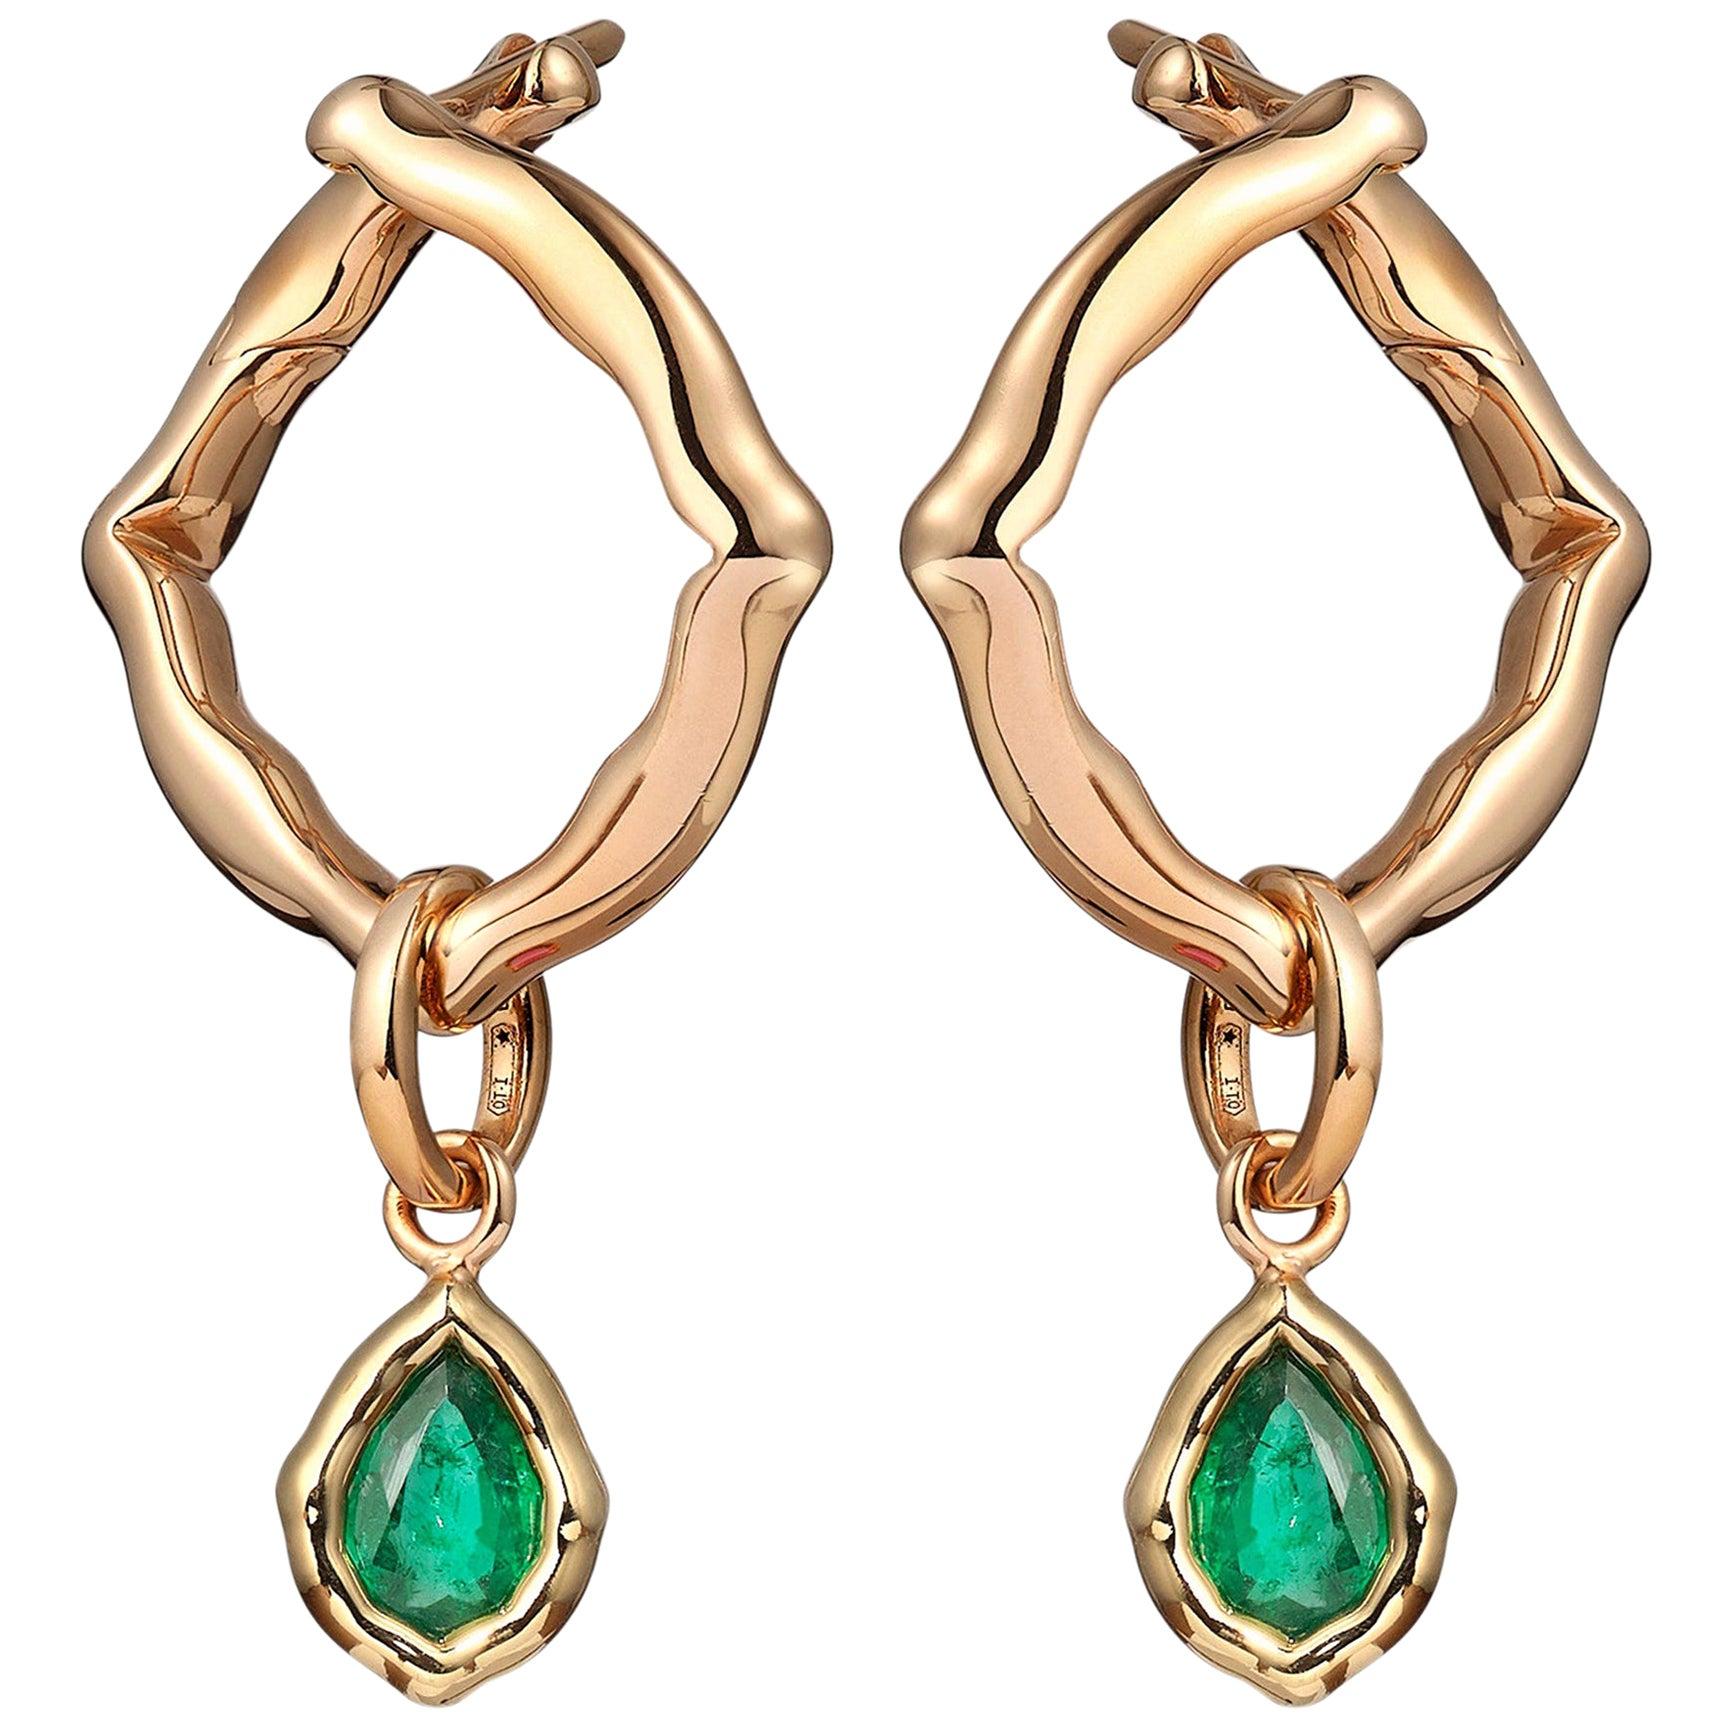 18 Karat Yellow Gold and Emeralds Hoop Earrings